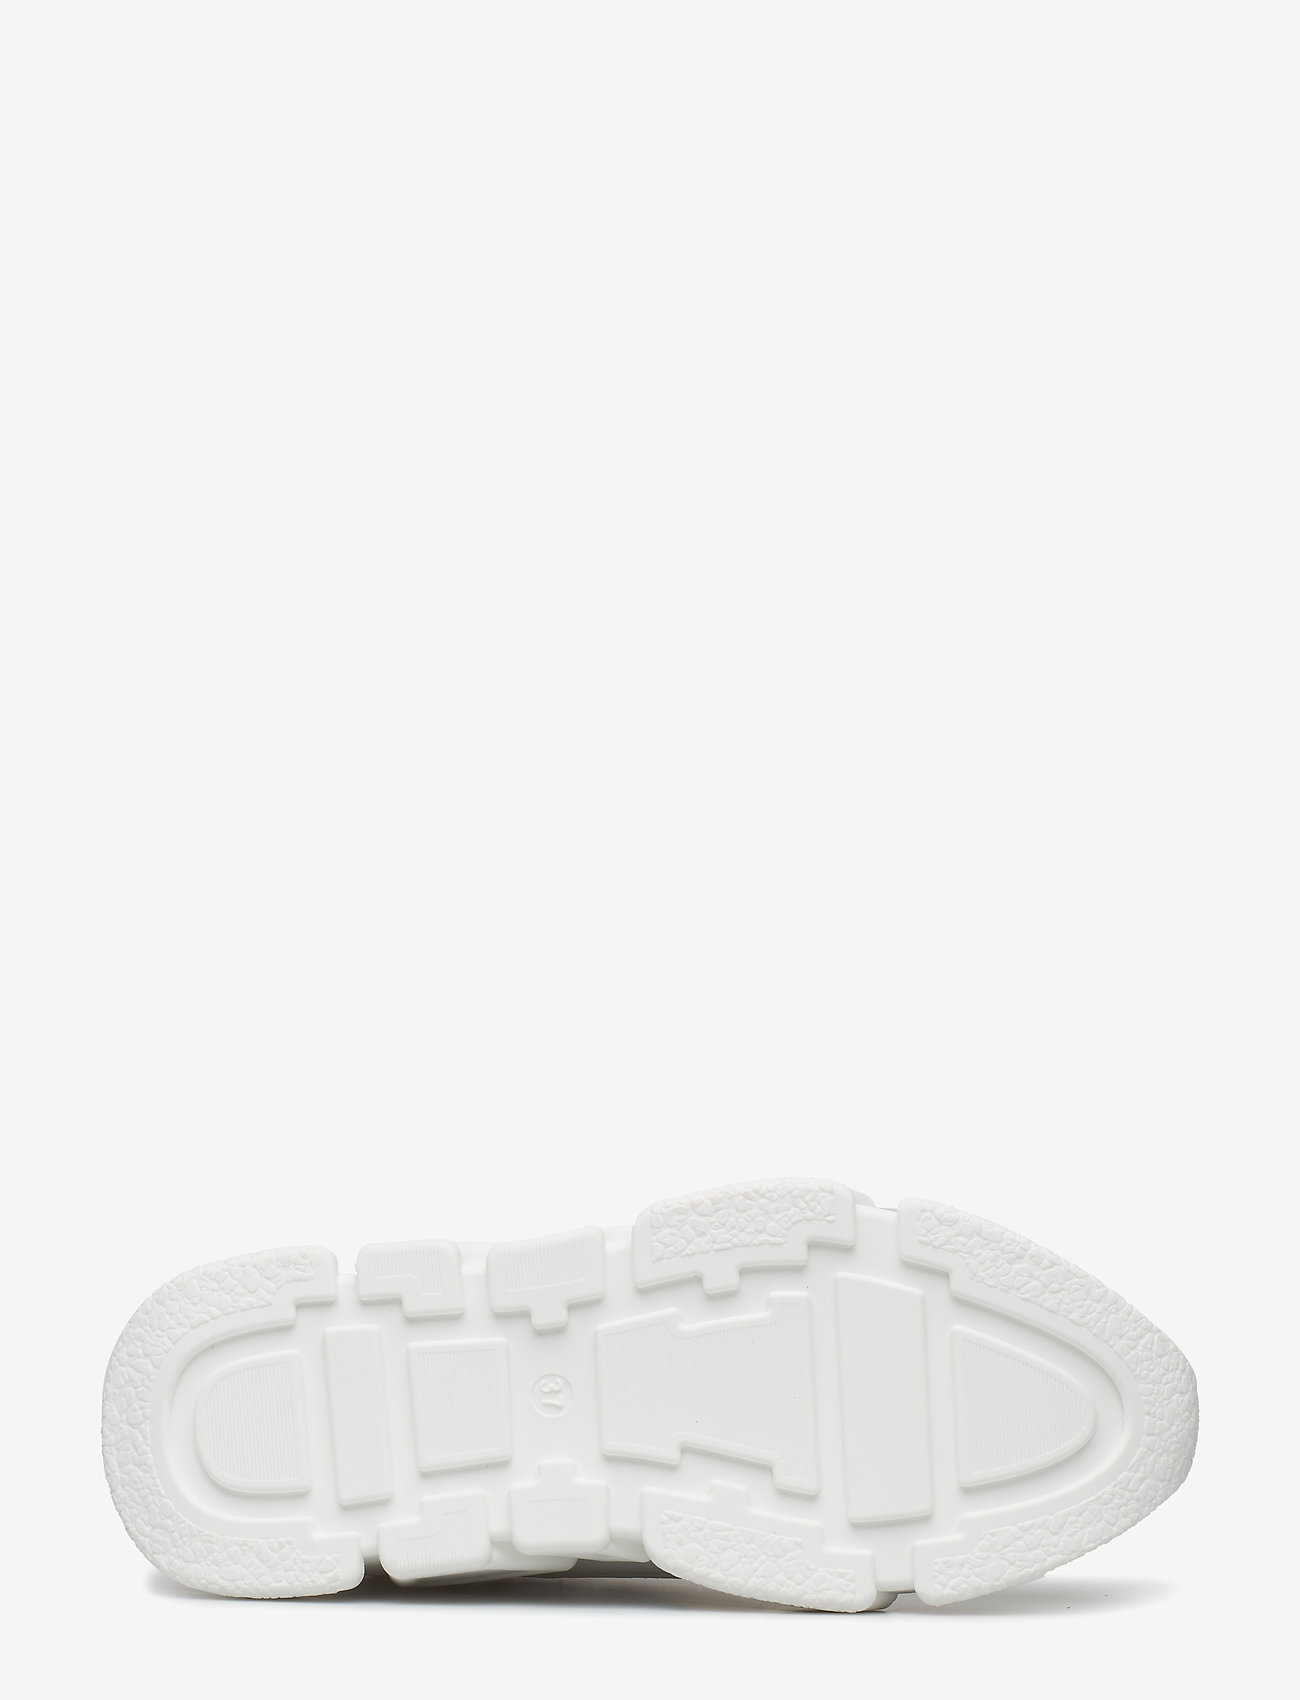 Shoes 8853 (White Comb. 793) - Billi Bi